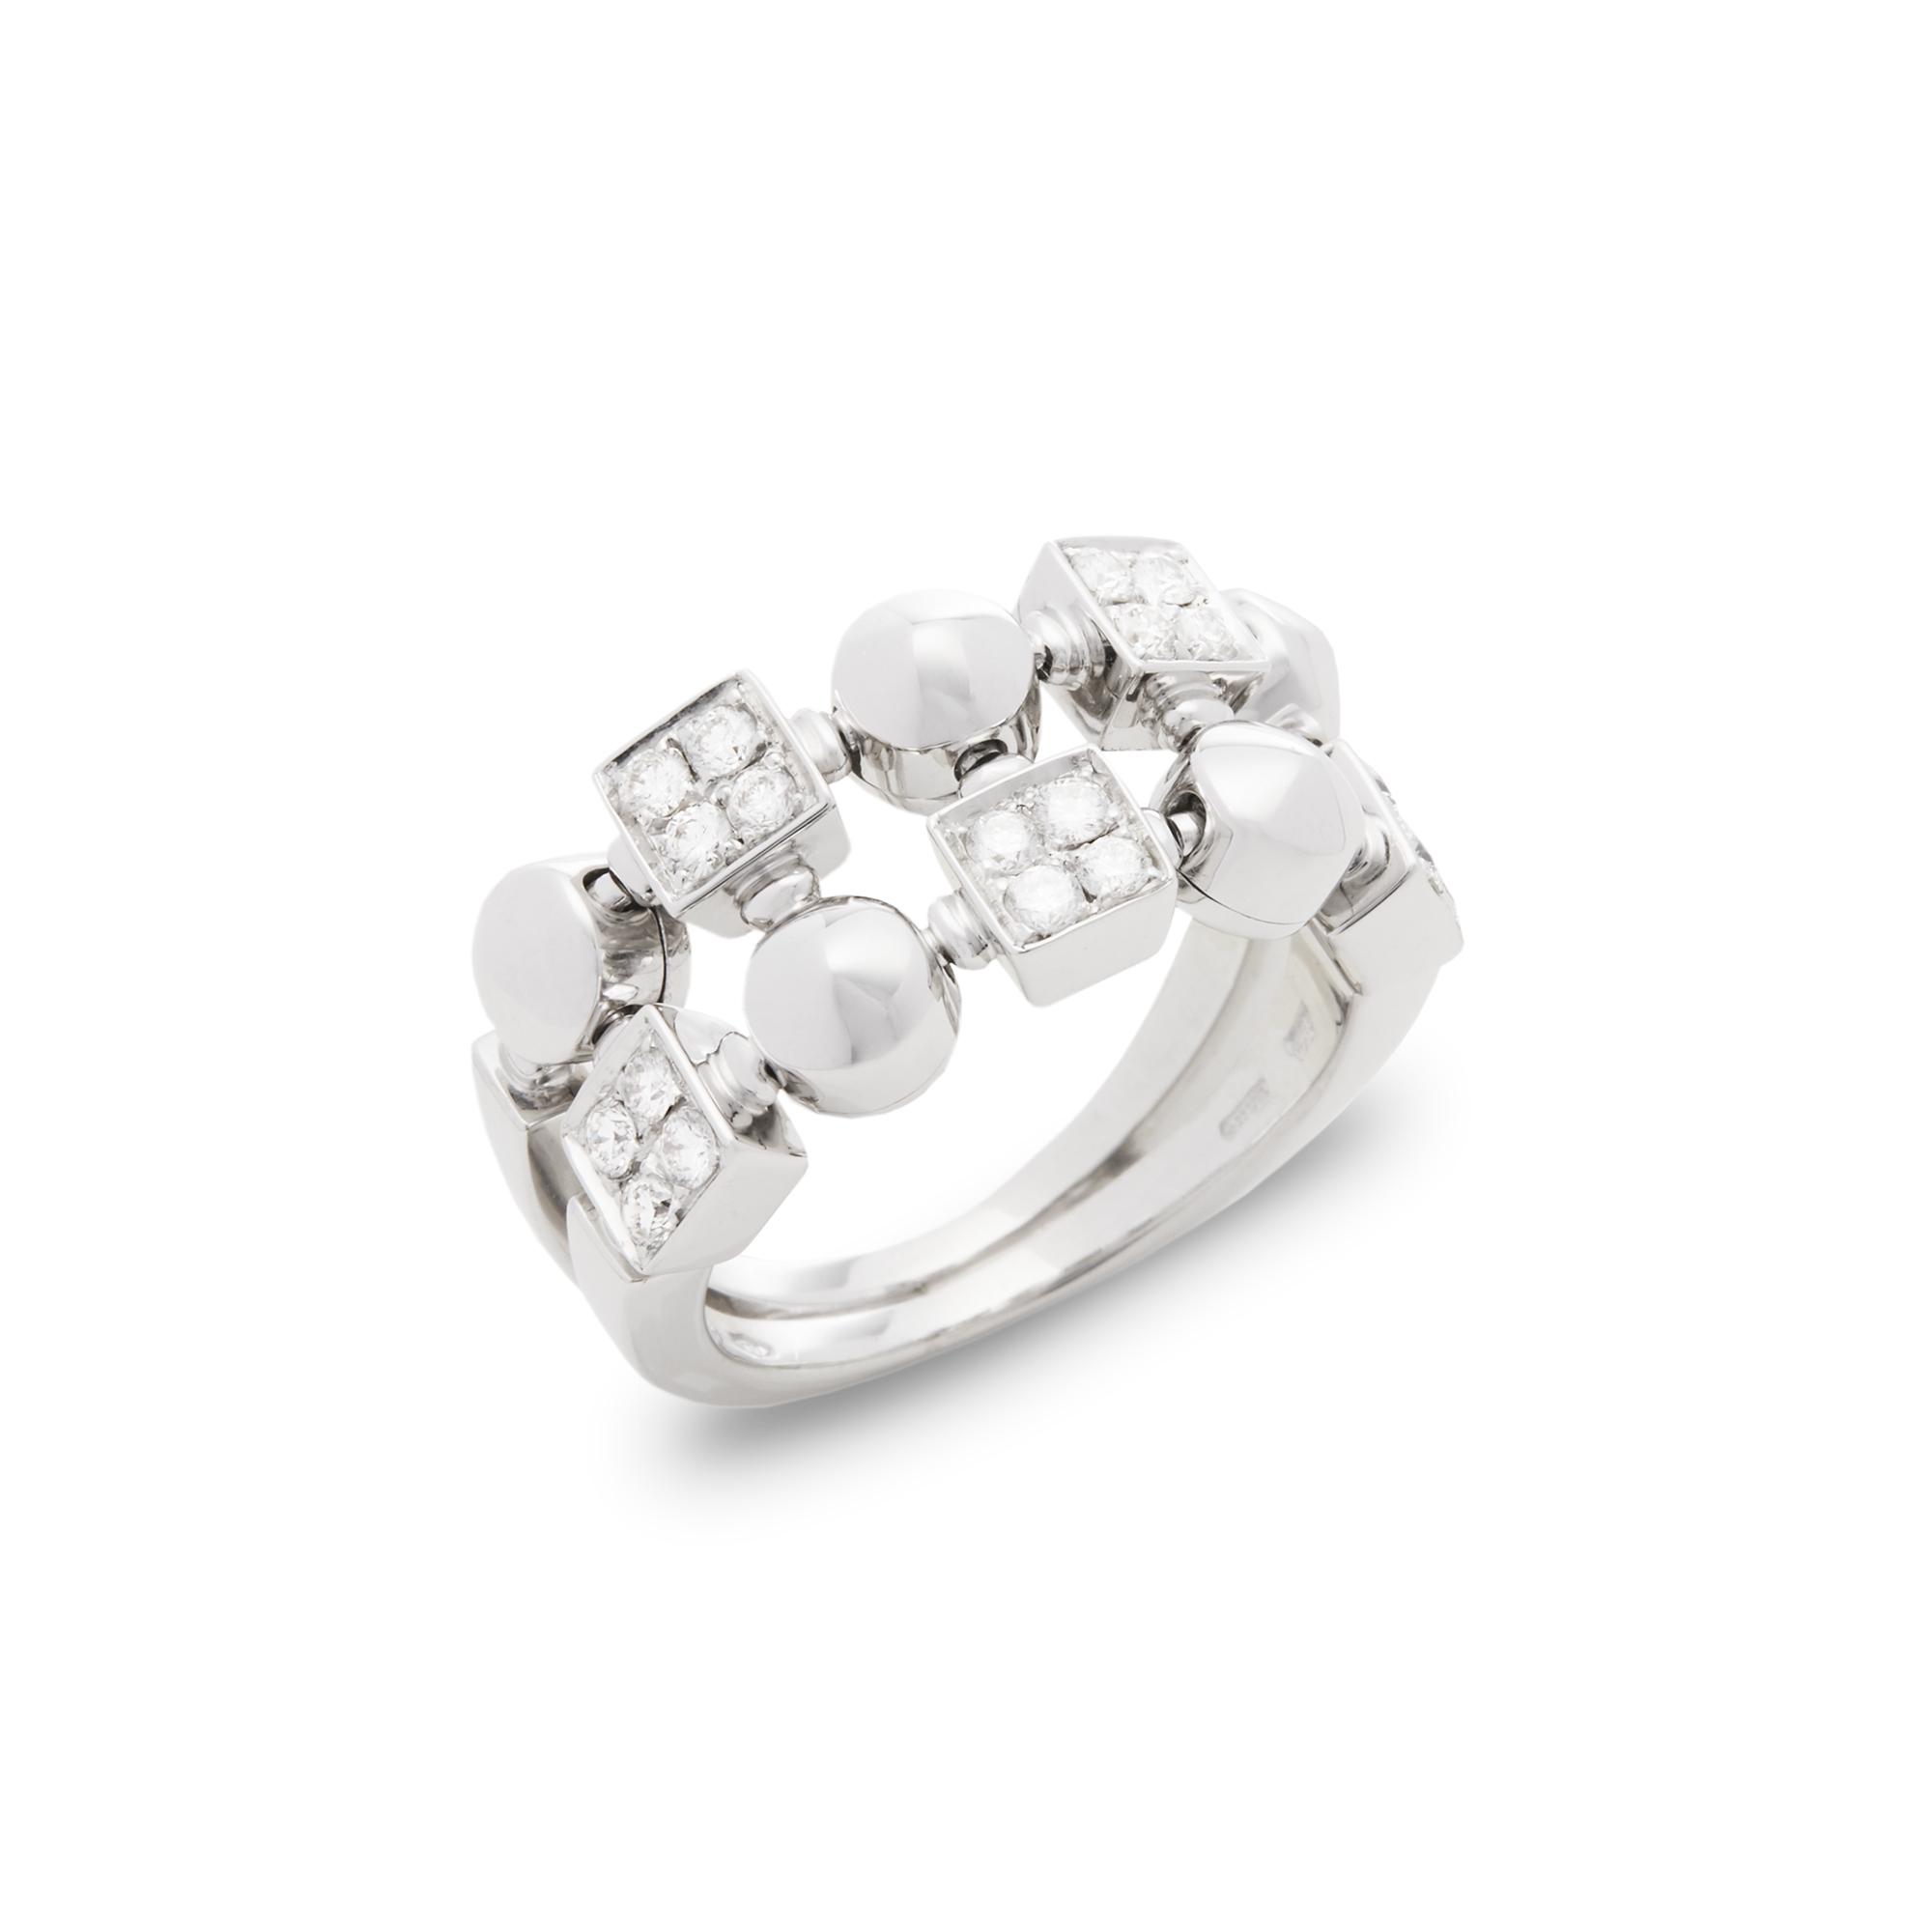 Bulgari 18ct White Gold Lucéa Diamond Ring